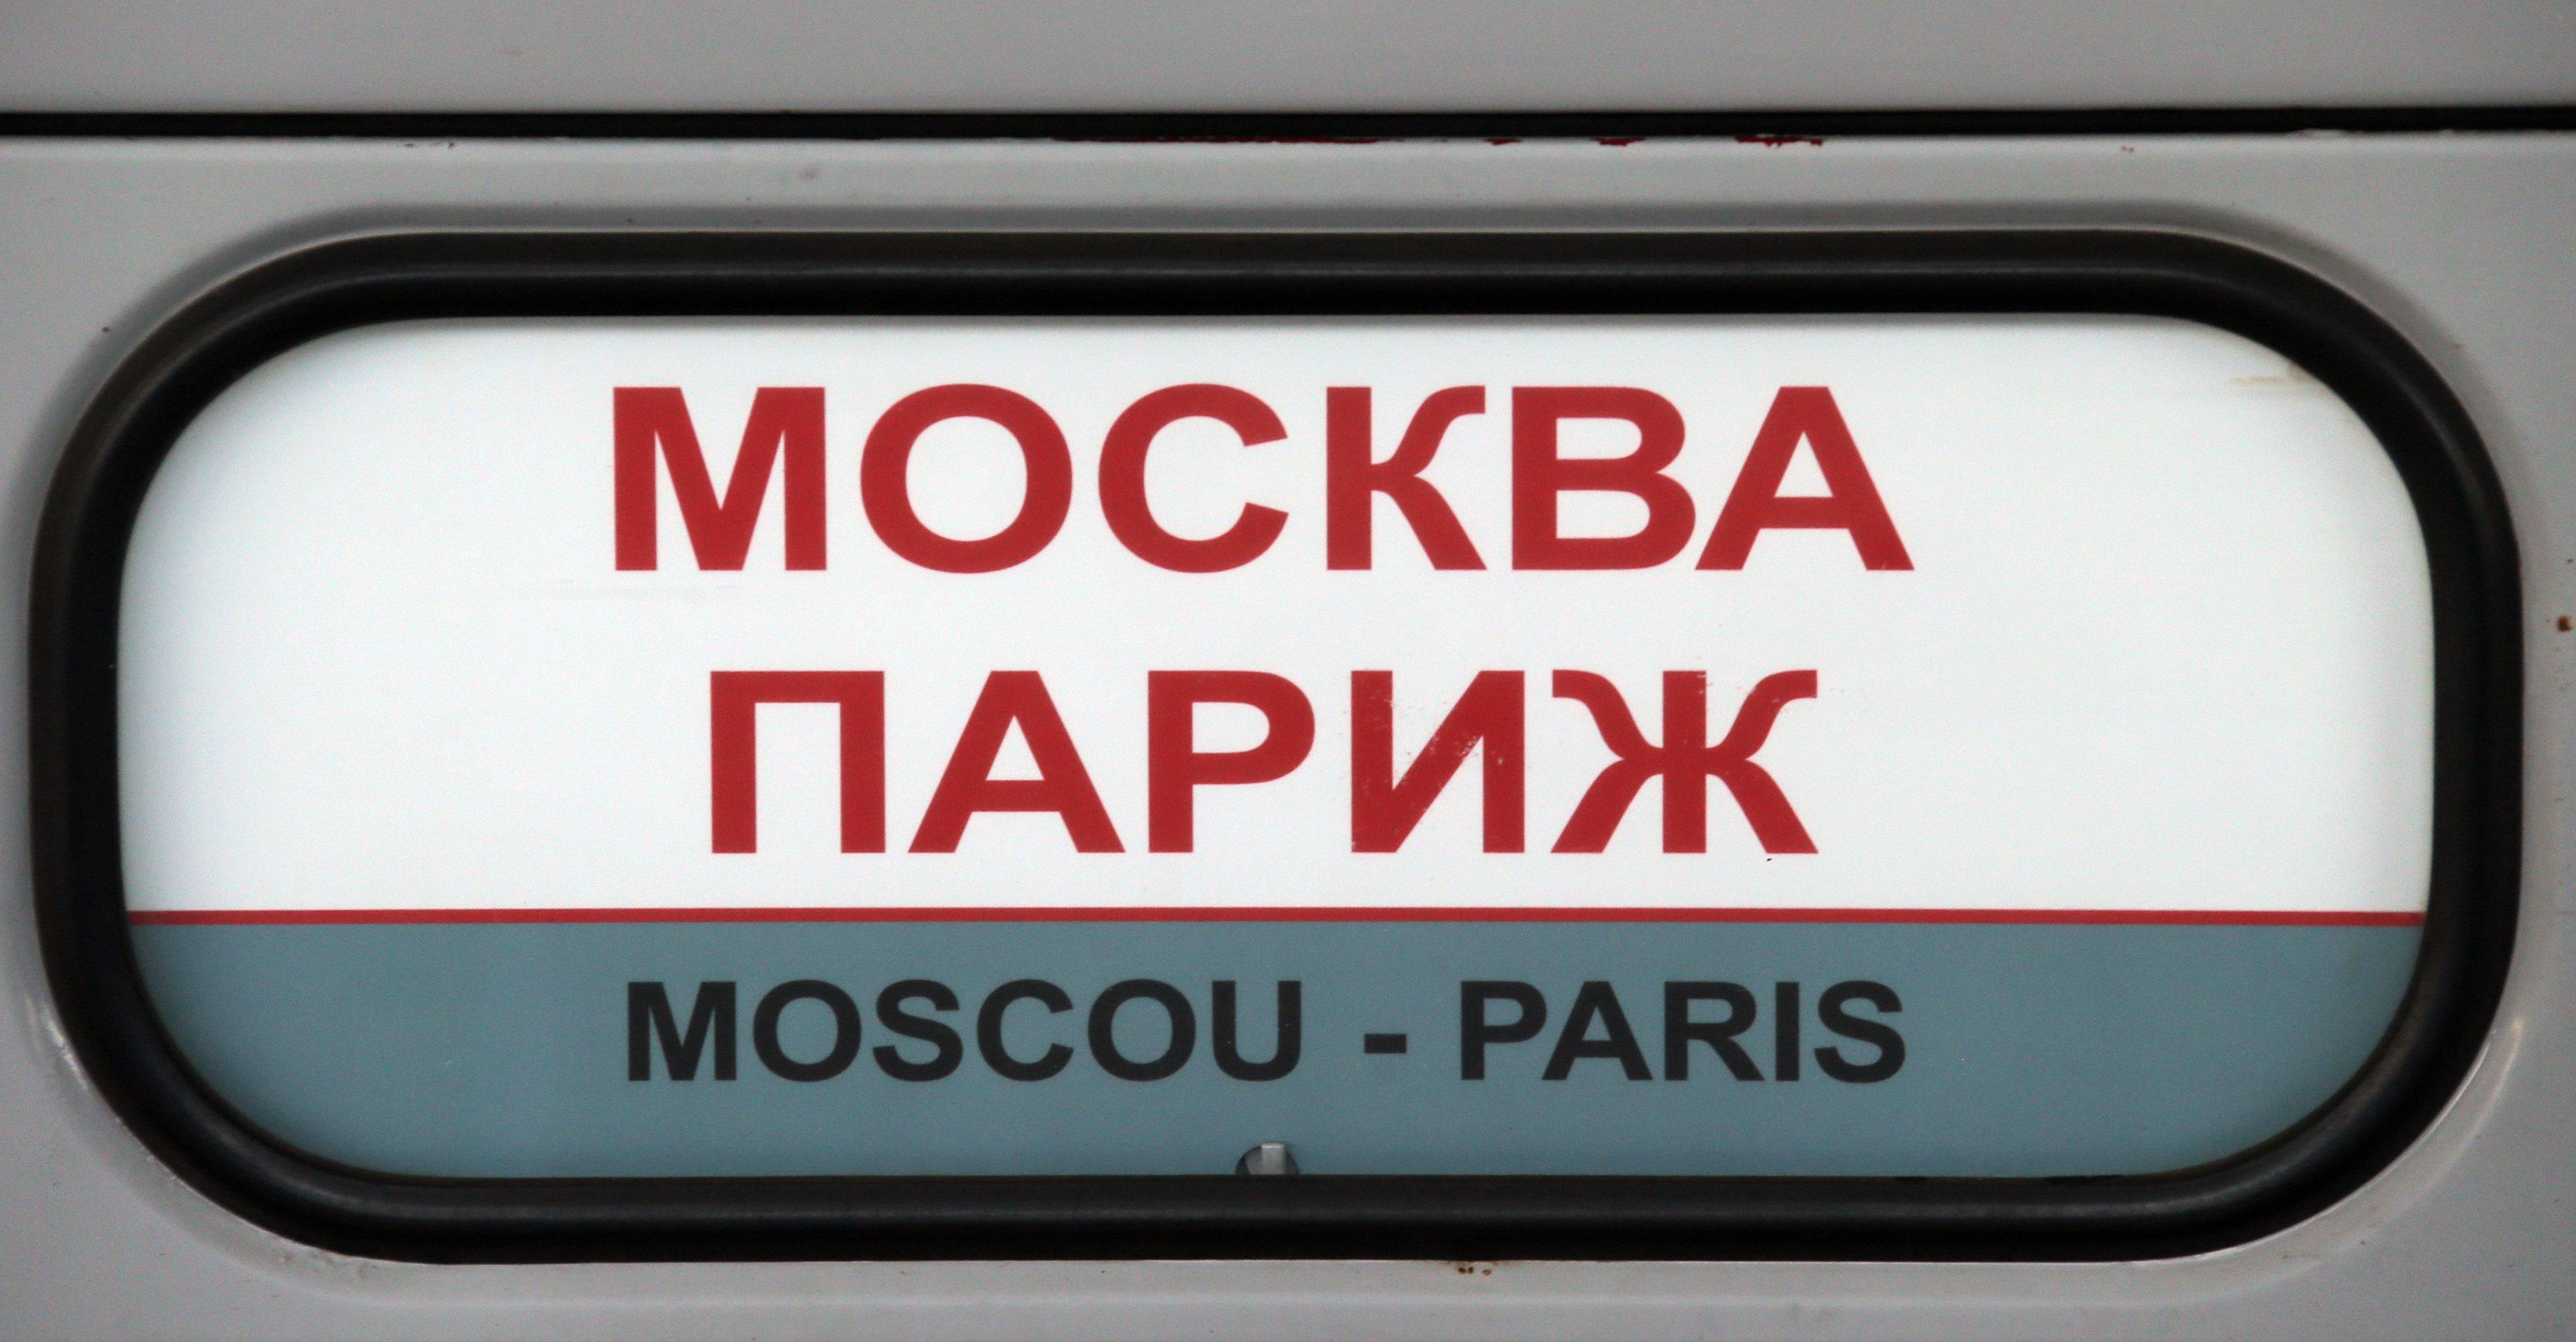 Le train Moscou-Paris